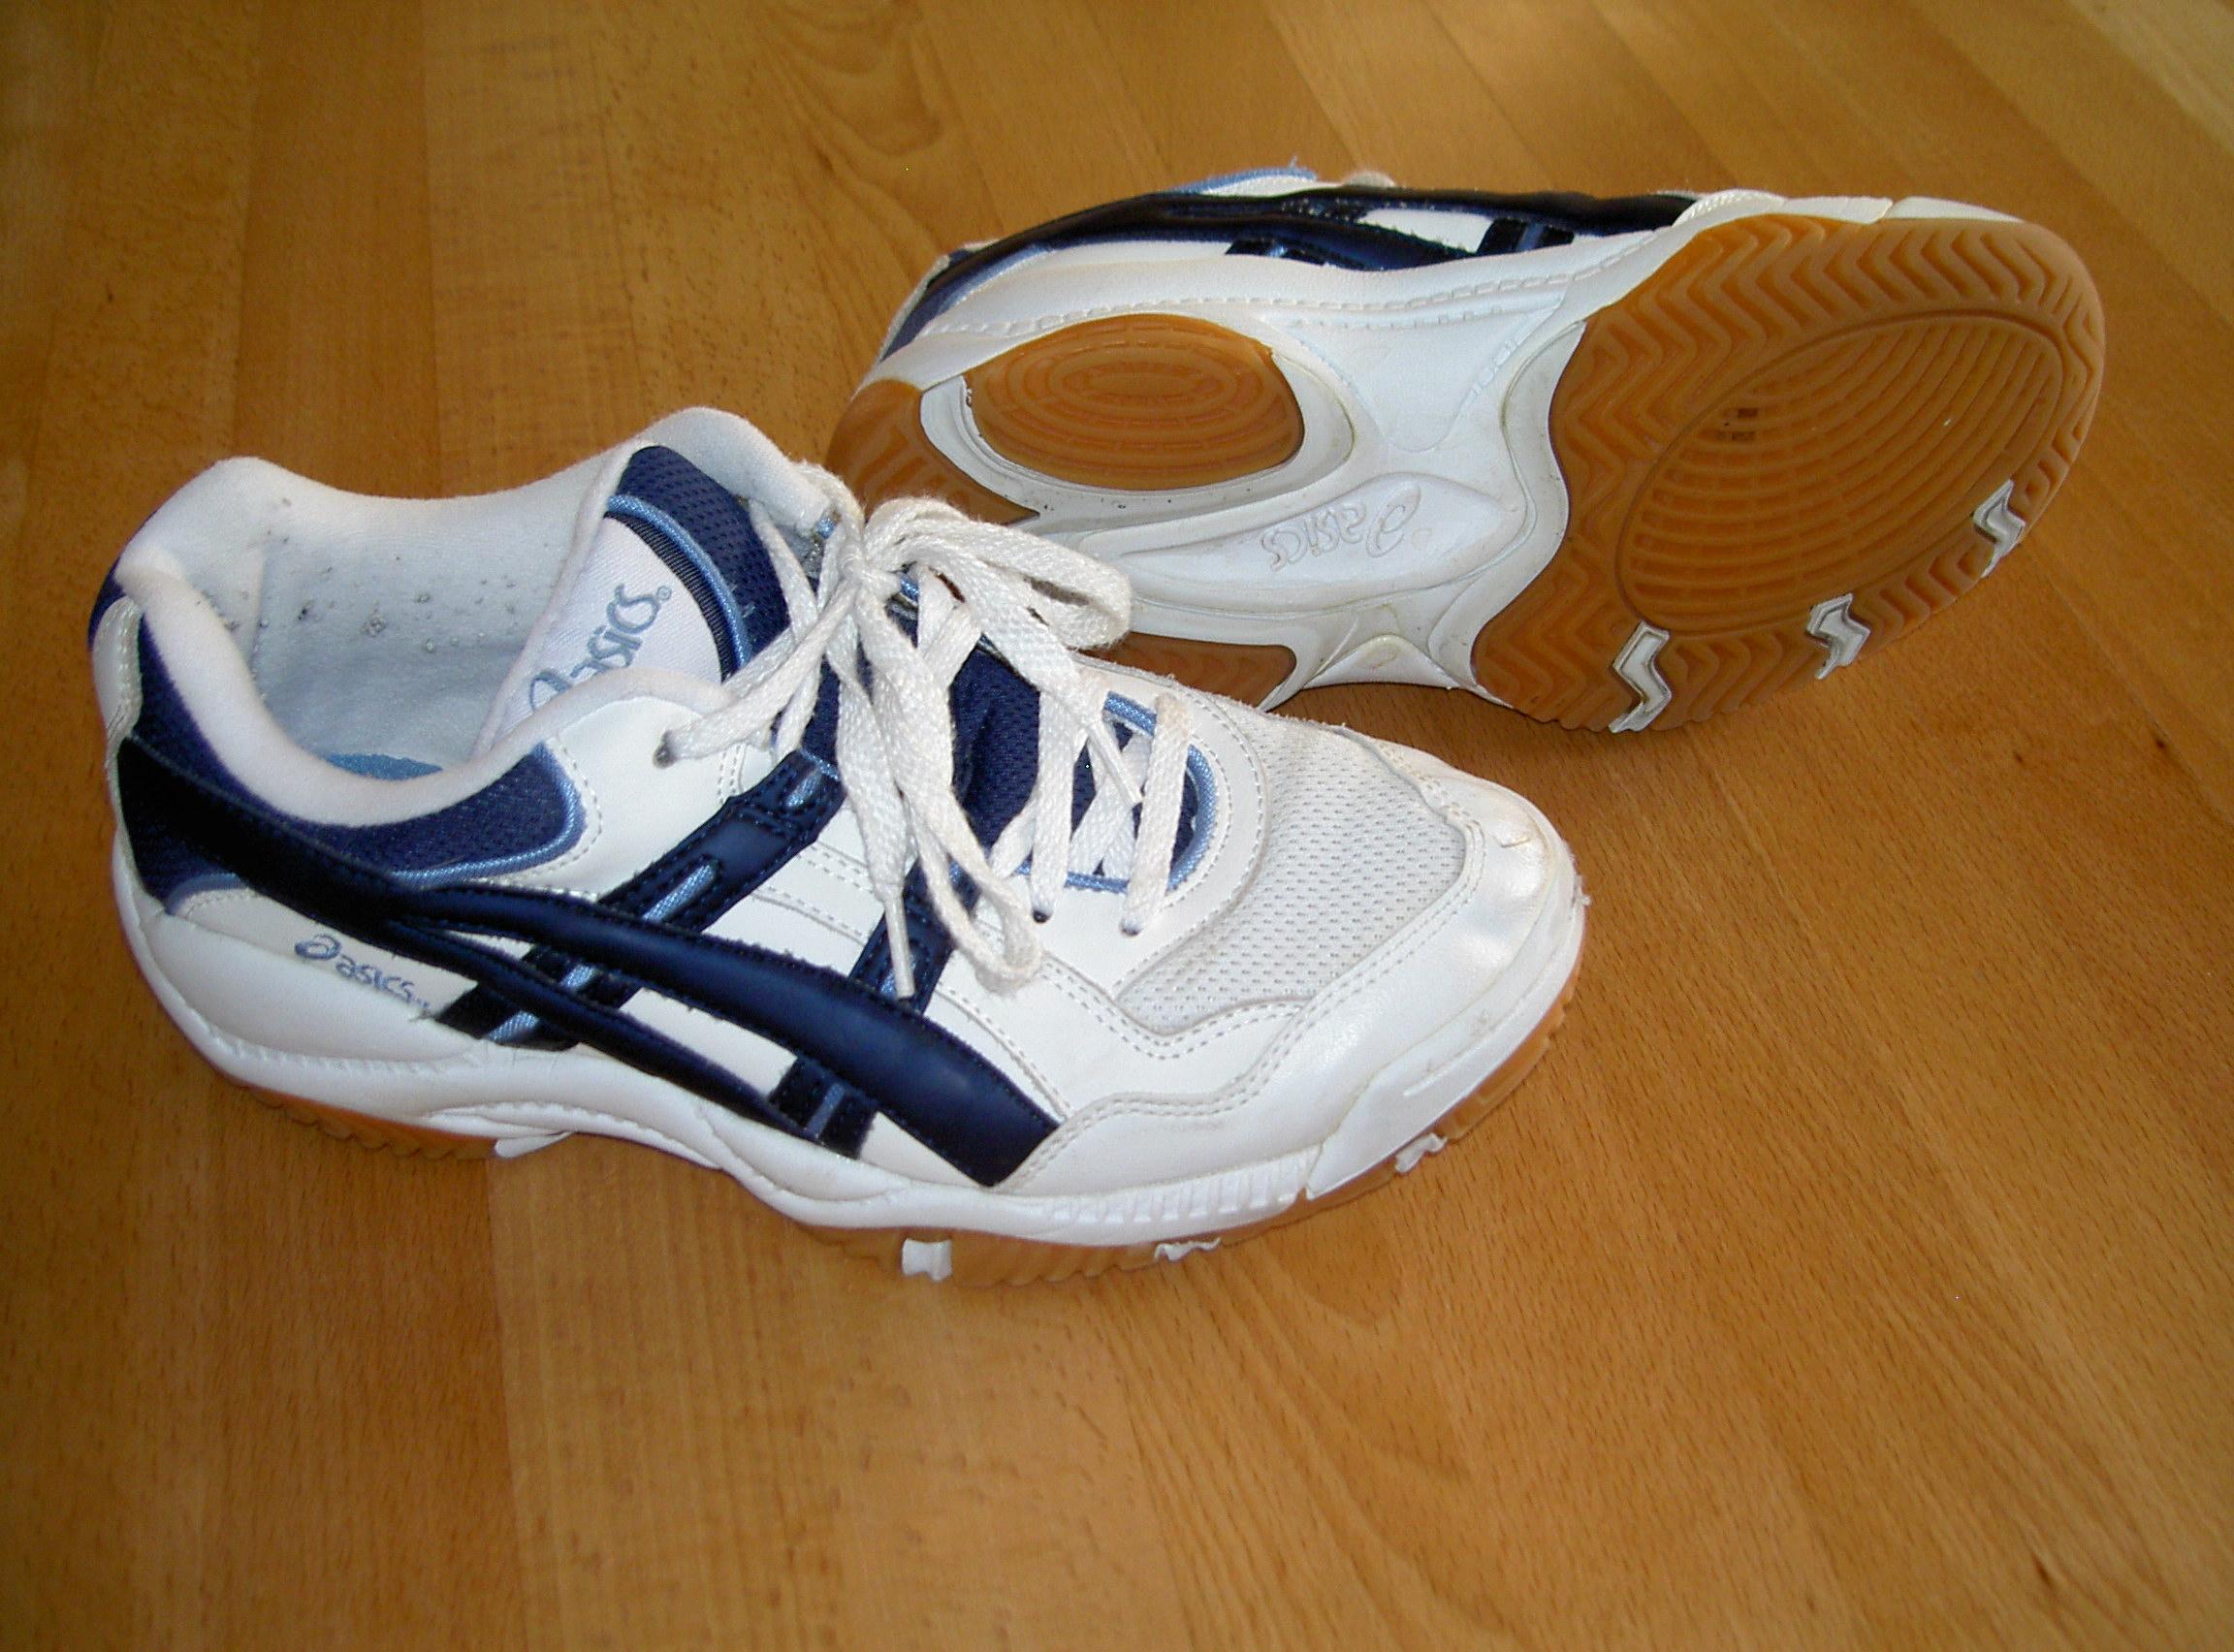 zapatos asics wikipedia